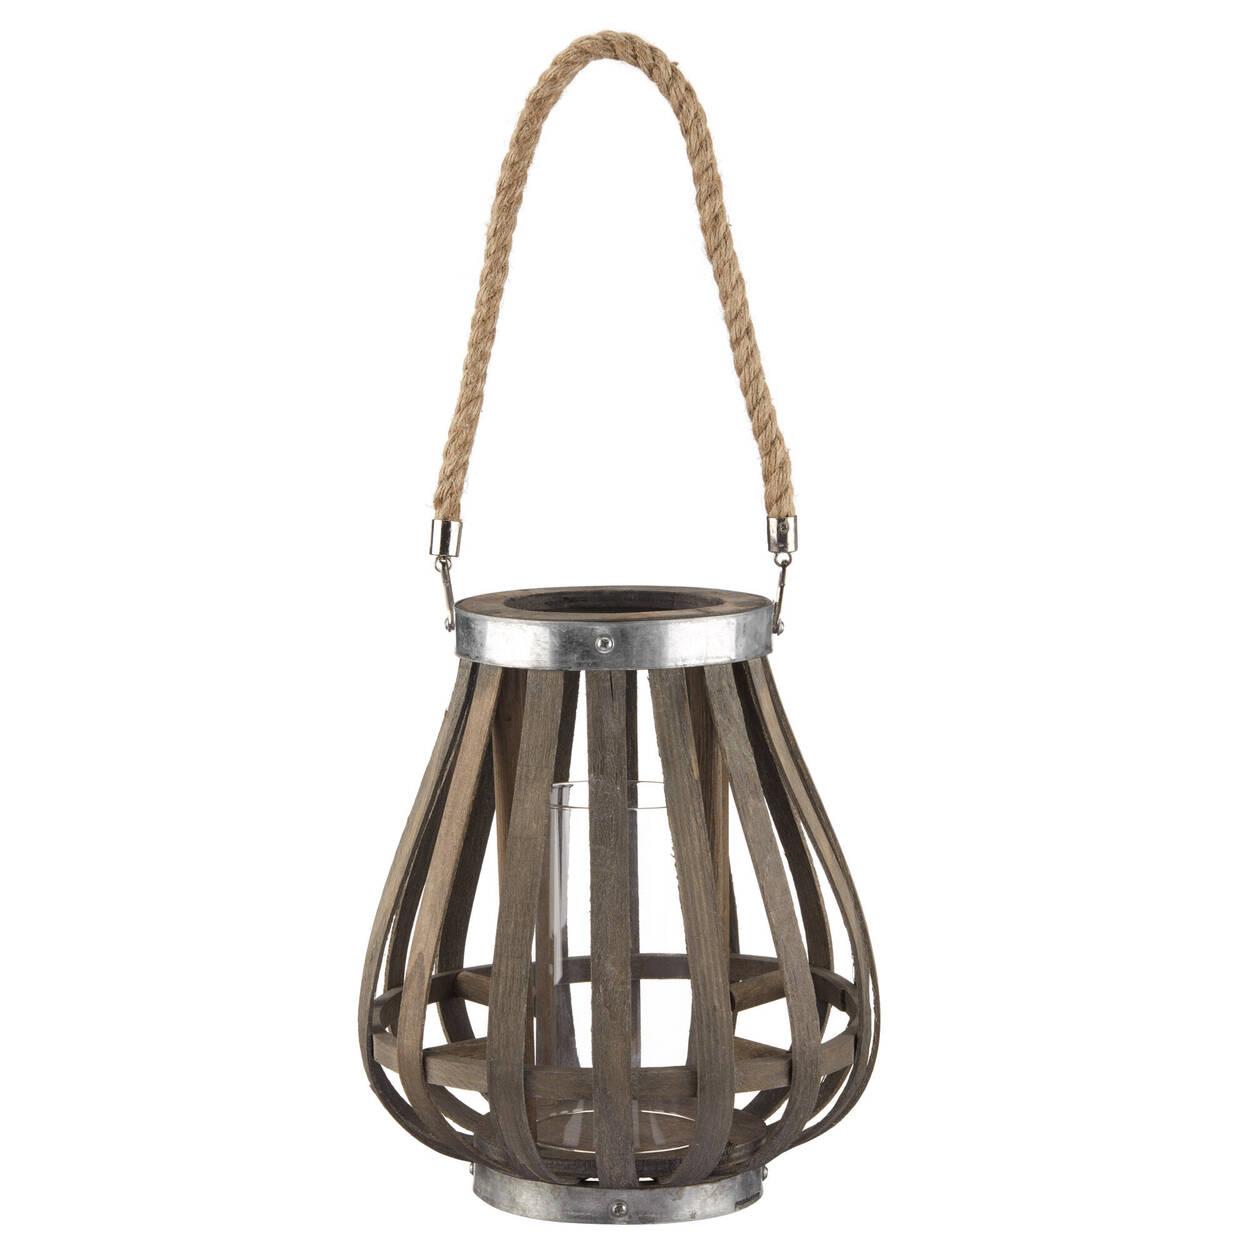 Wood Lantern with Rope Handle